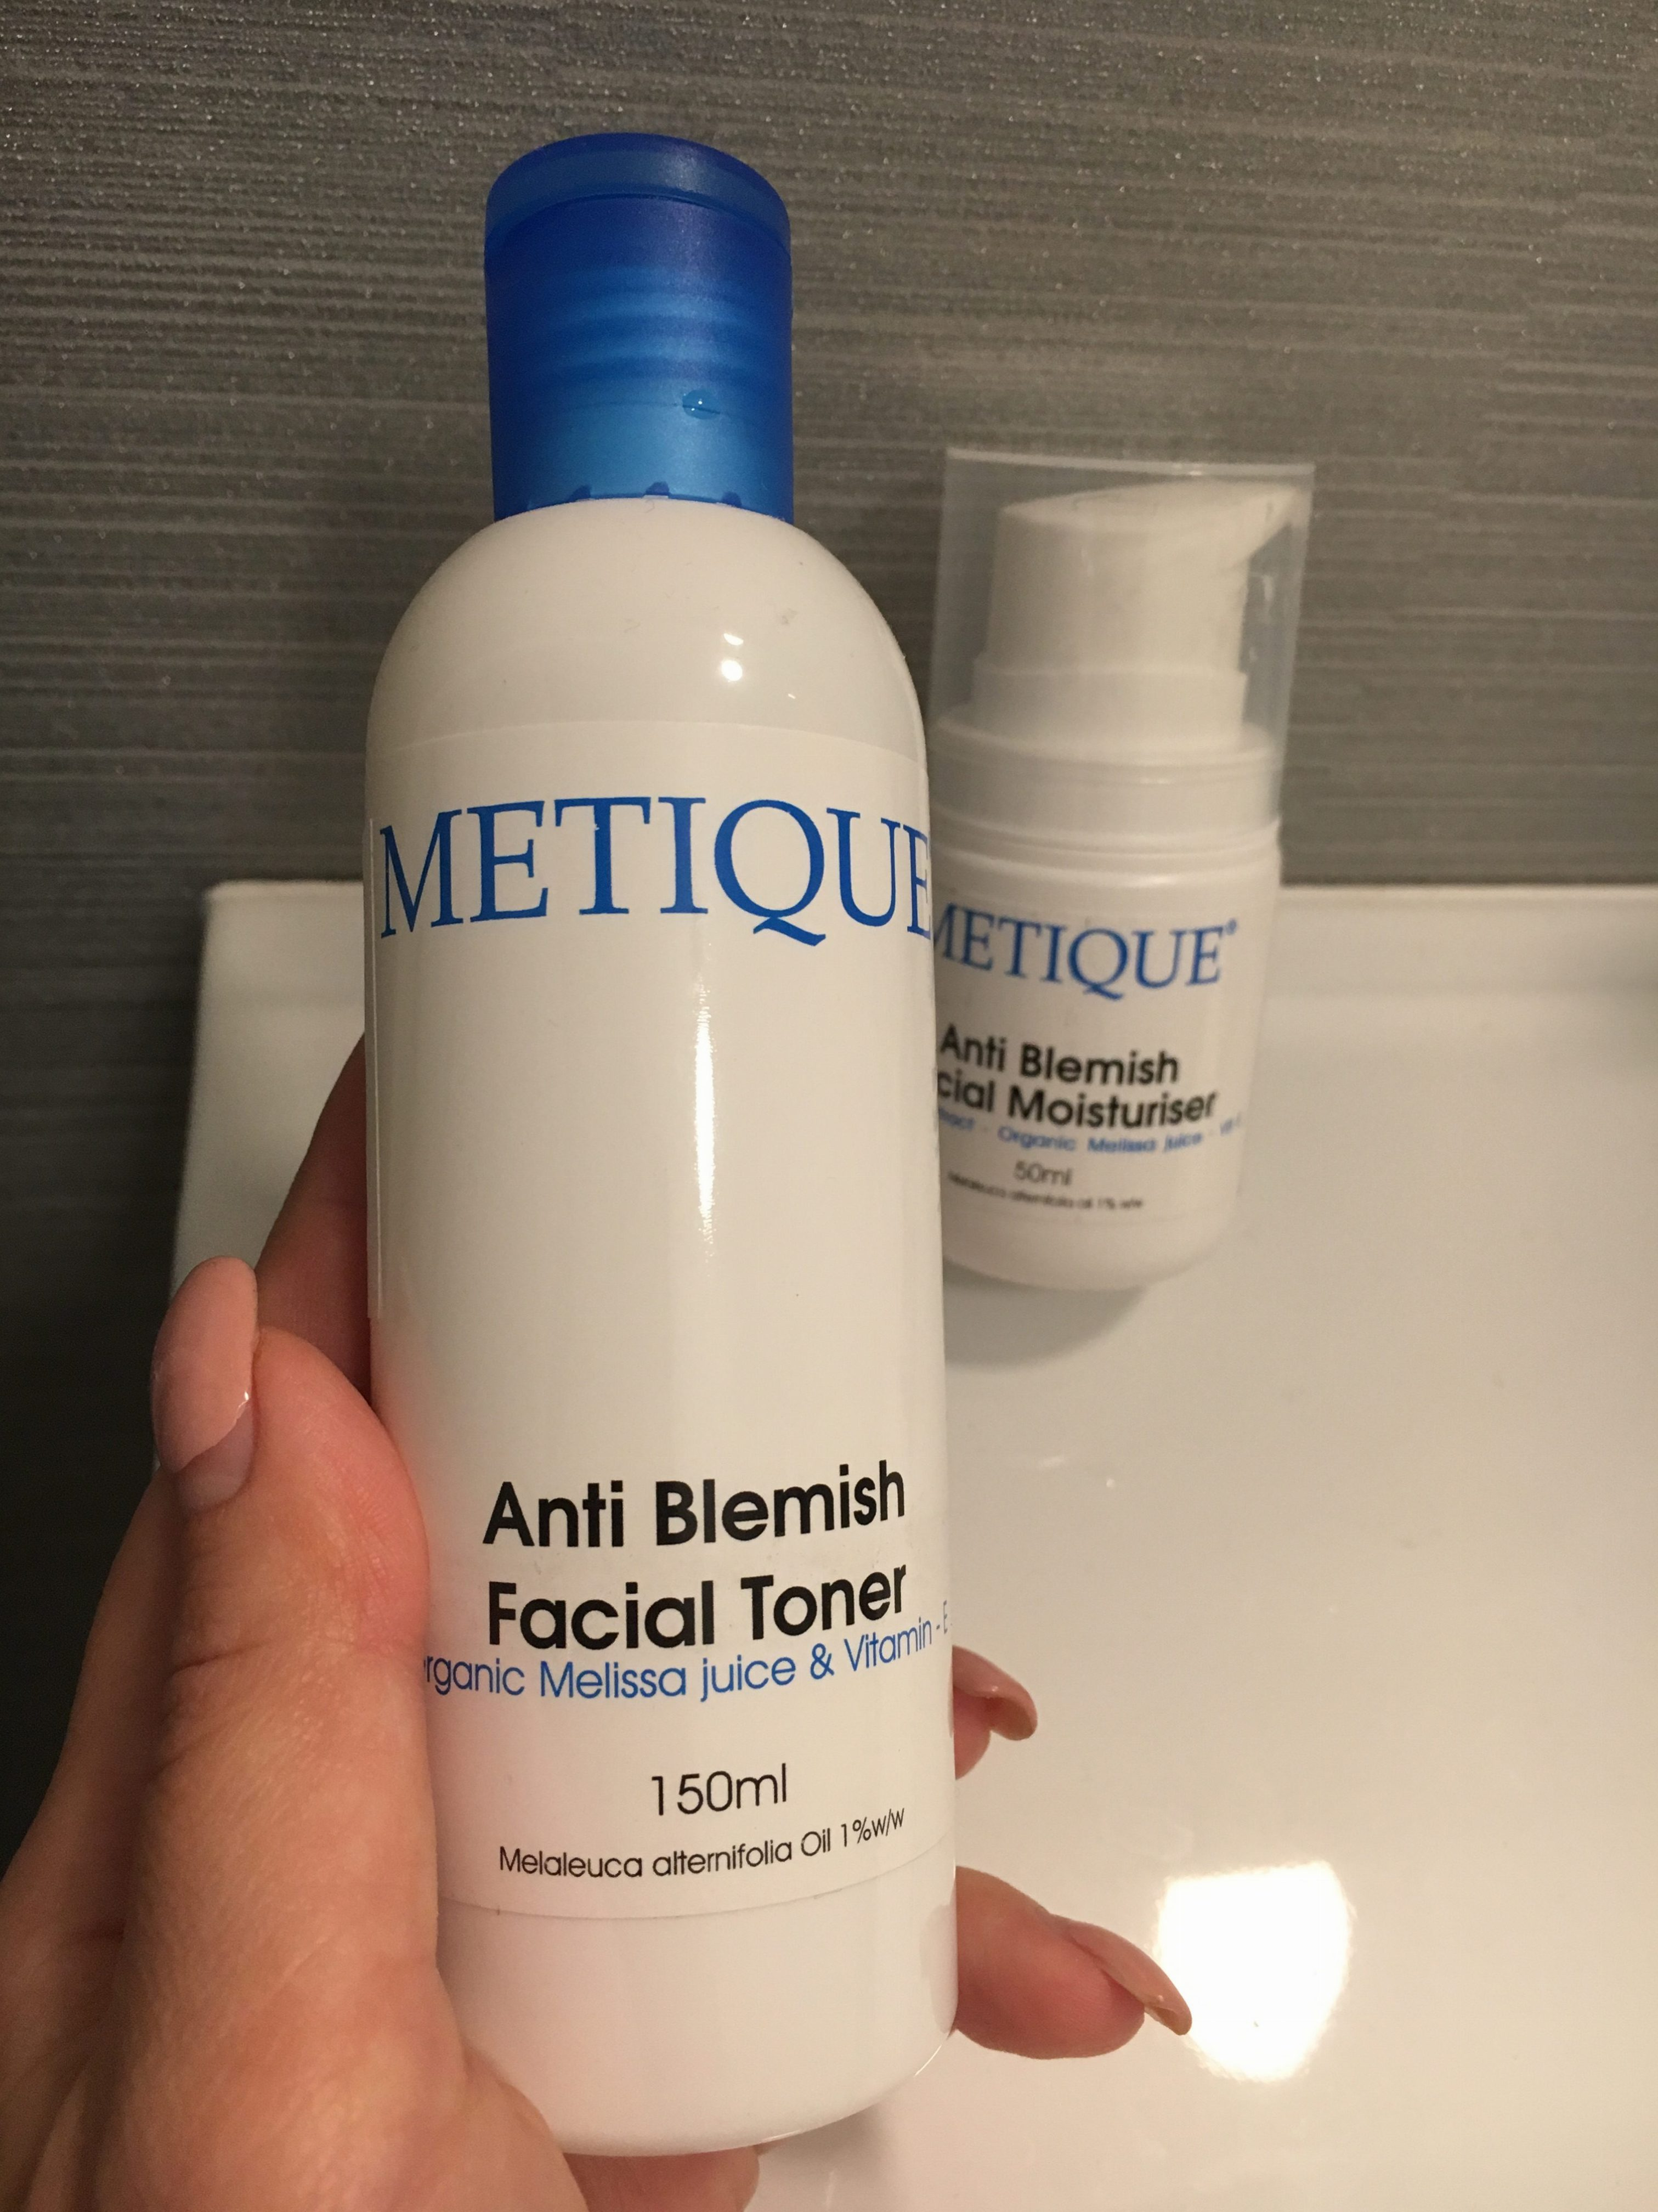 Metique